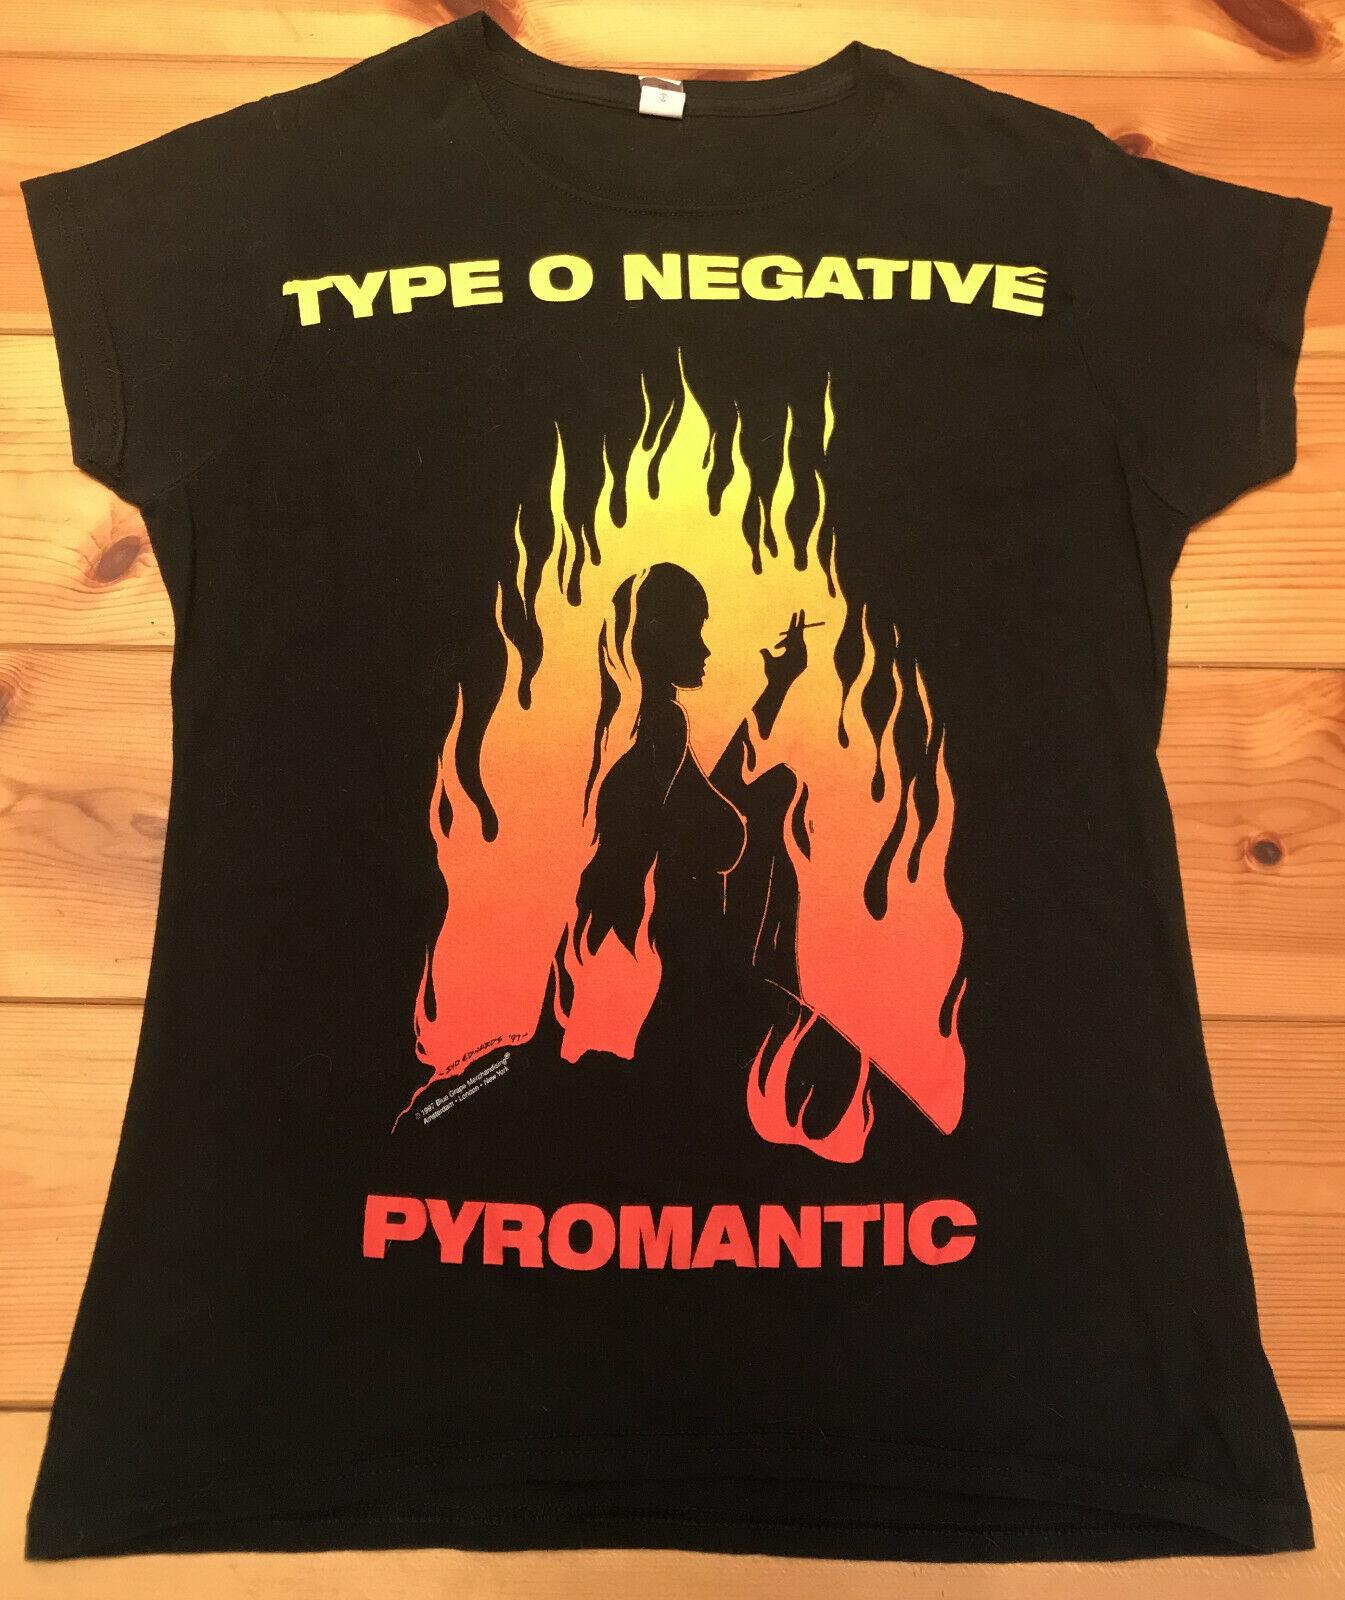 ⛔️ TYPE O NEGATIVE ⛔️ 1997 Pyromantic Shirt Size M ⛔️ CARNIVORE ⛔️ PETER STEELE